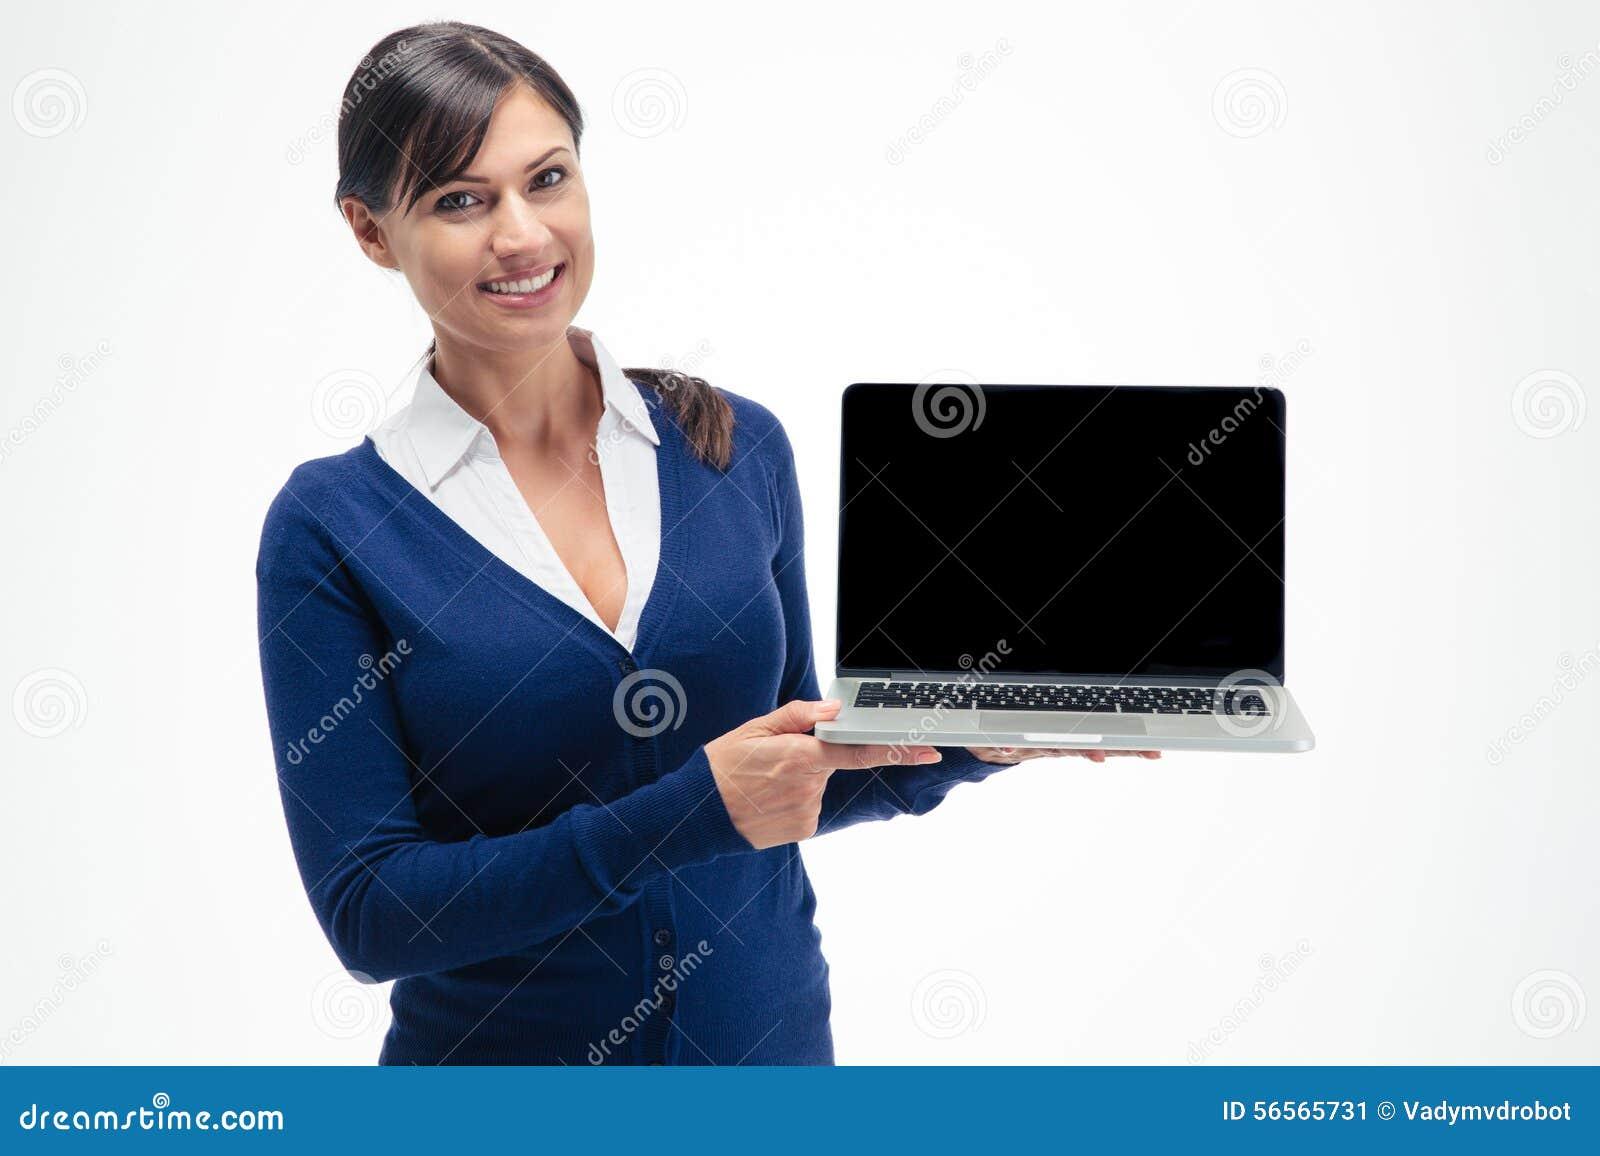 Download Επιχειρηματίας που παρουσιάζει κενή οθόνη φορητών προσωπικών υπολογιστών Στοκ Εικόνα - εικόνα από αντίγραφο, οριζόντιος: 56565731